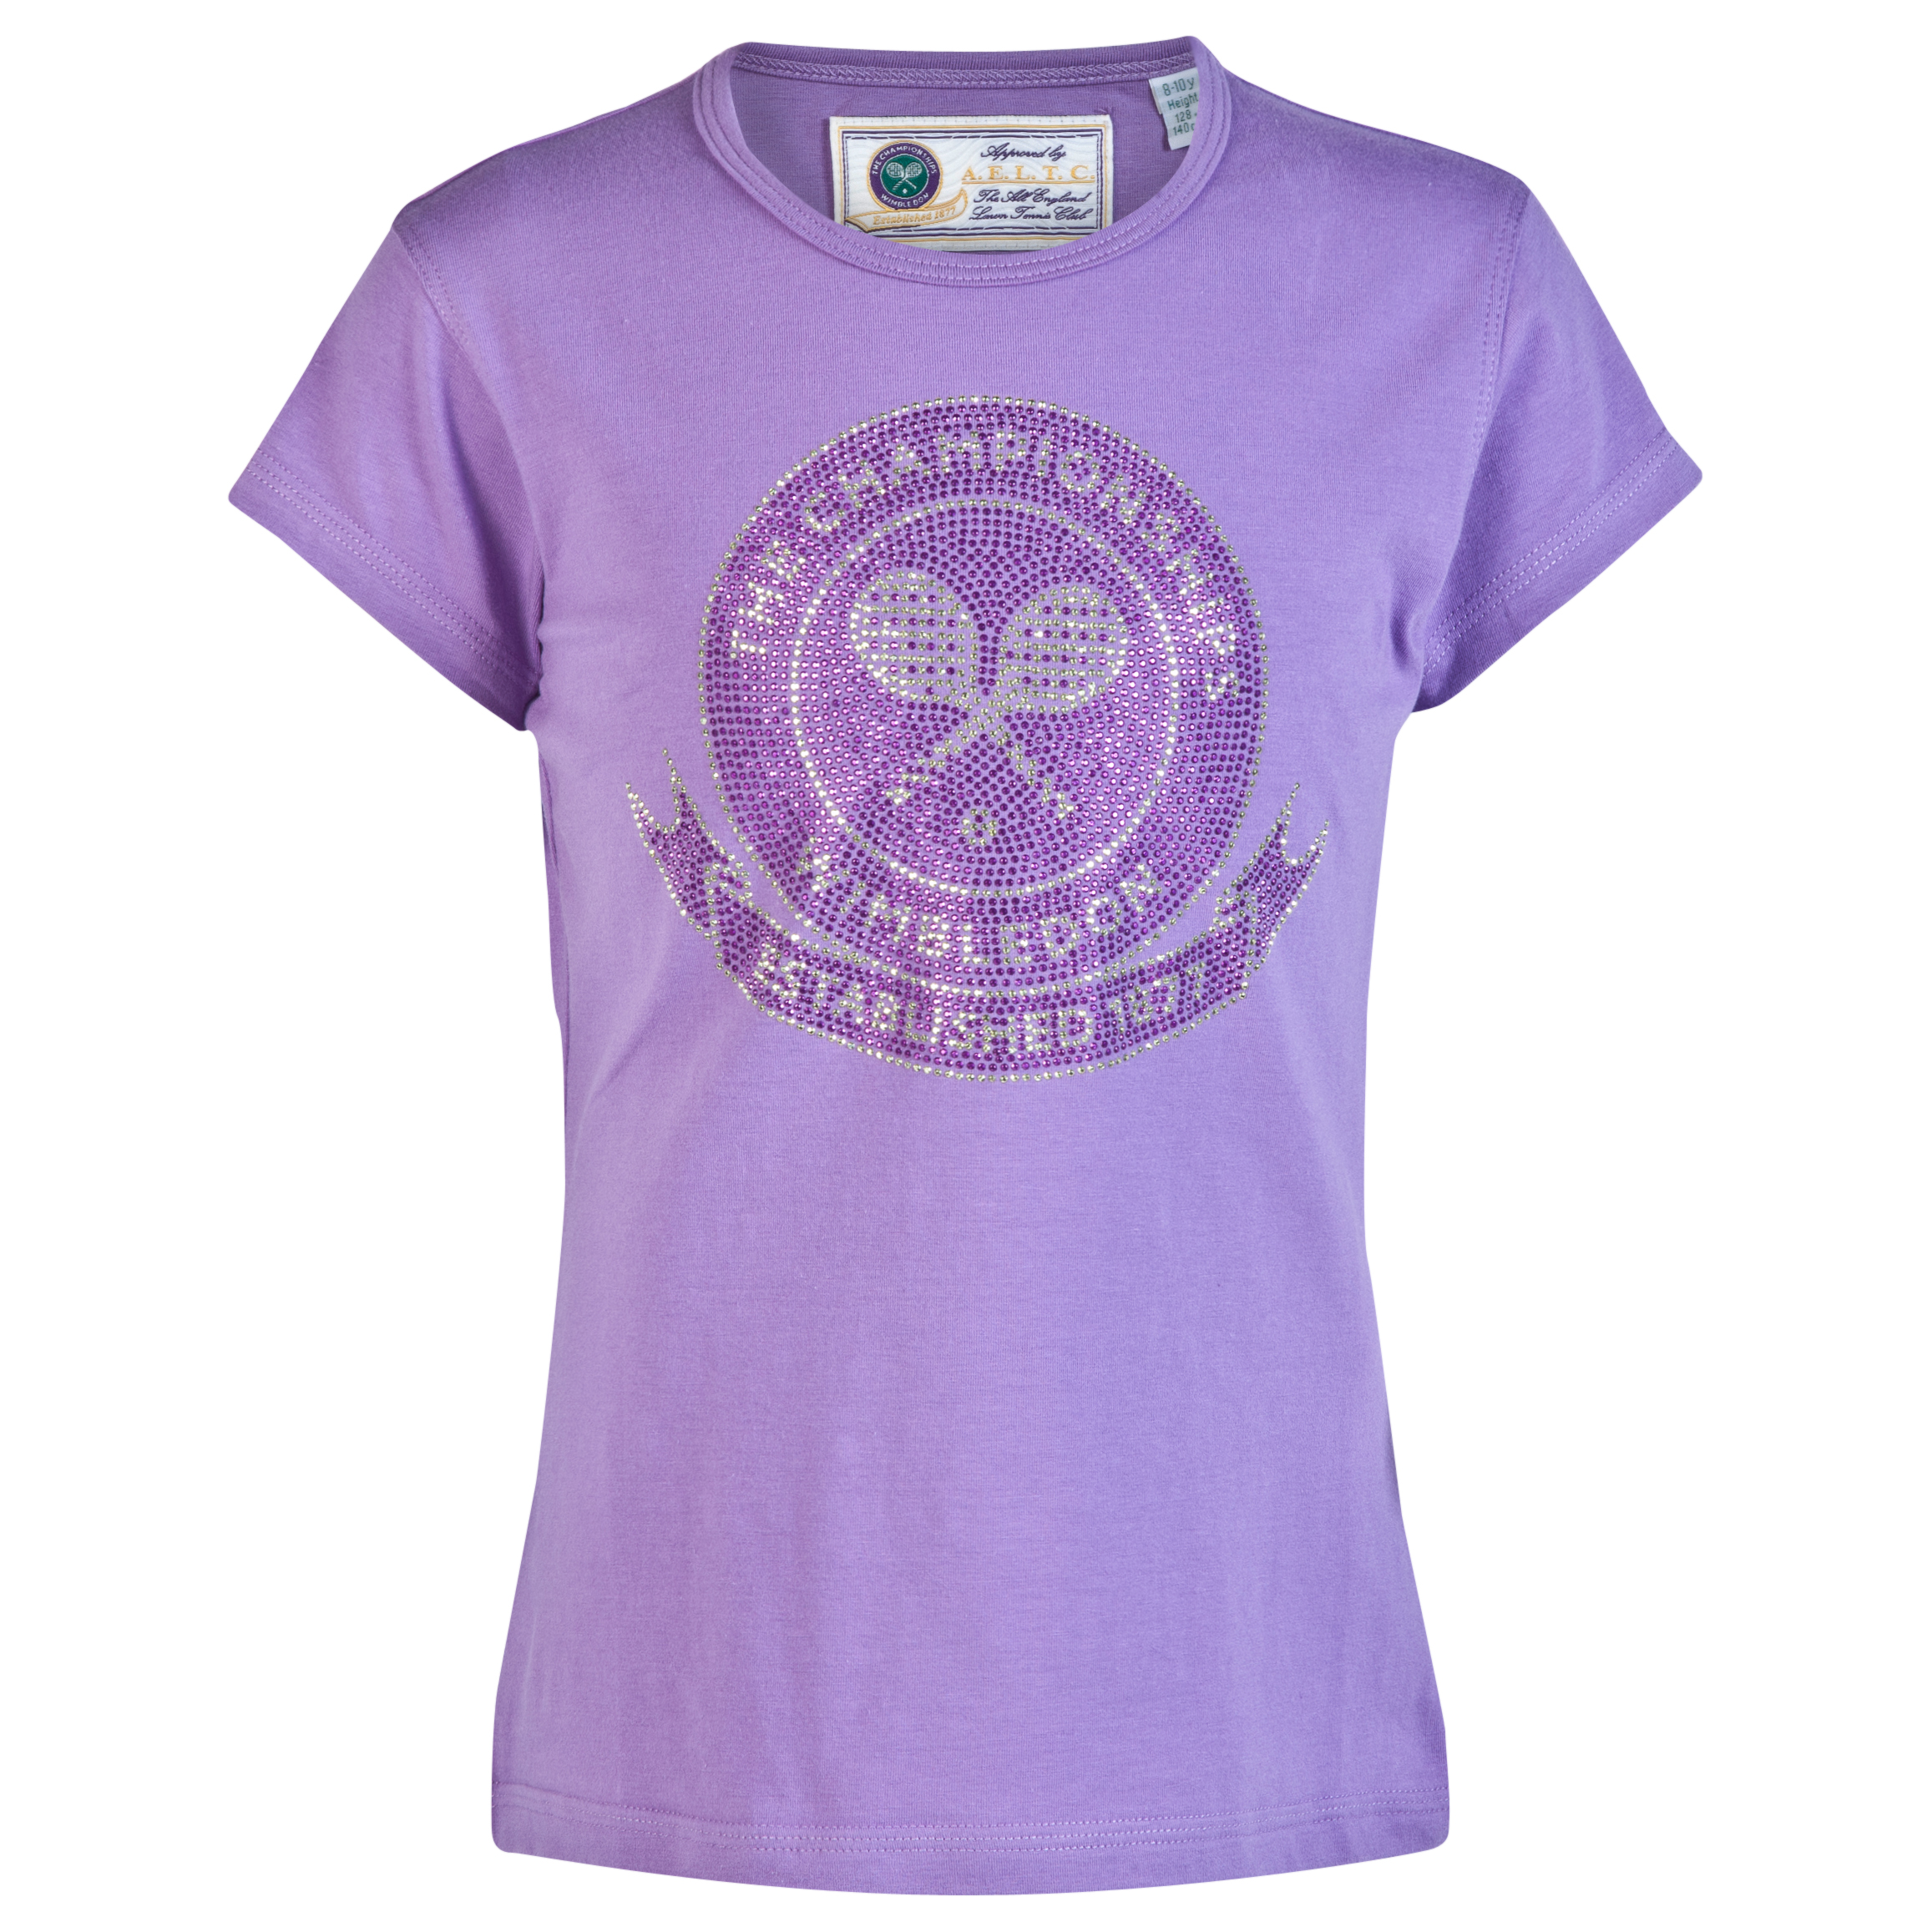 Wimbledon Rhinestone T-Shirt - Girls